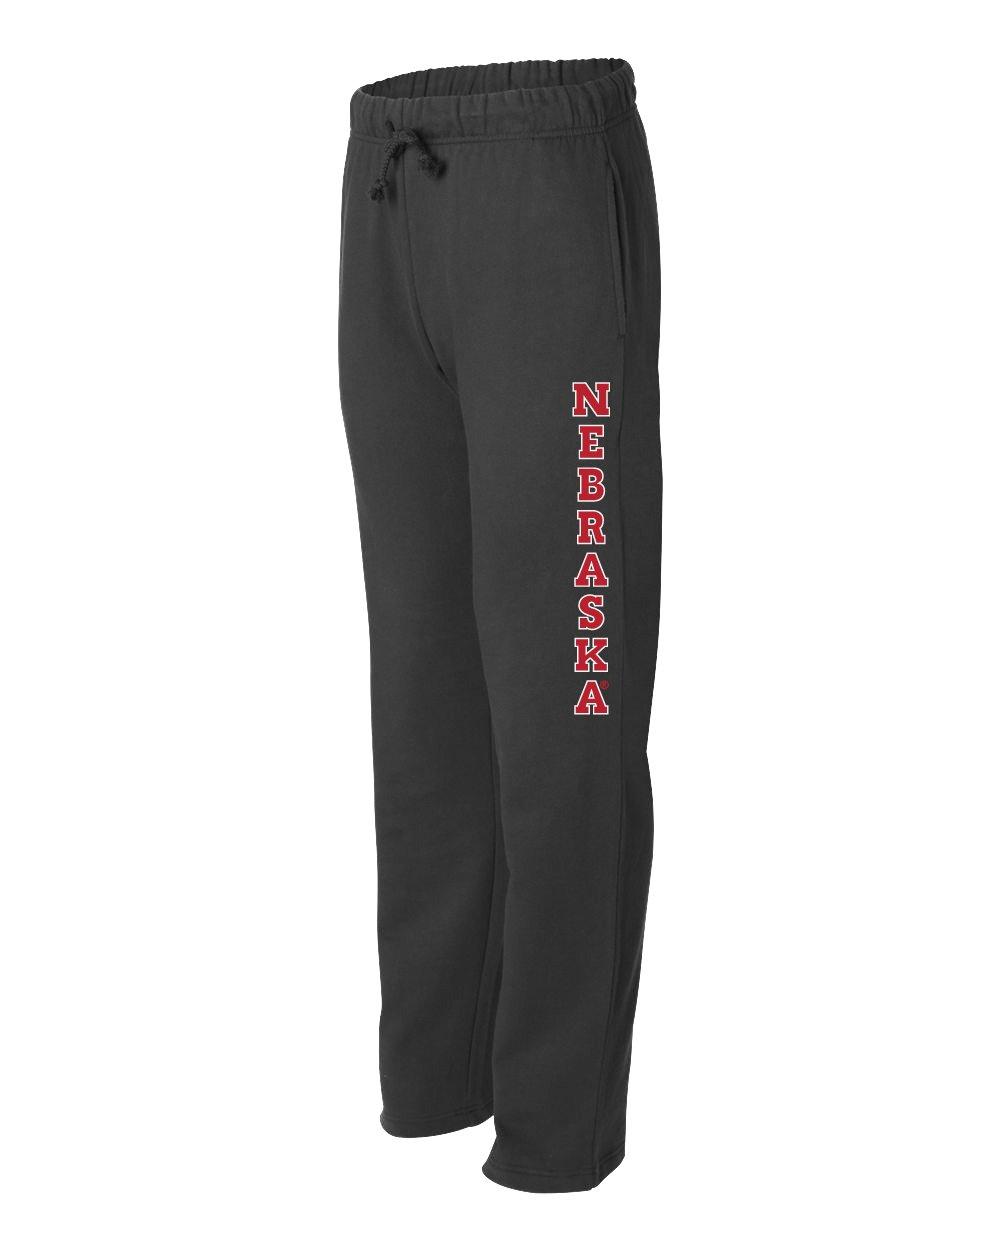 You Choose CornBorn 20 Premium Nebraska Fleece Sweatpants Husker Graphics